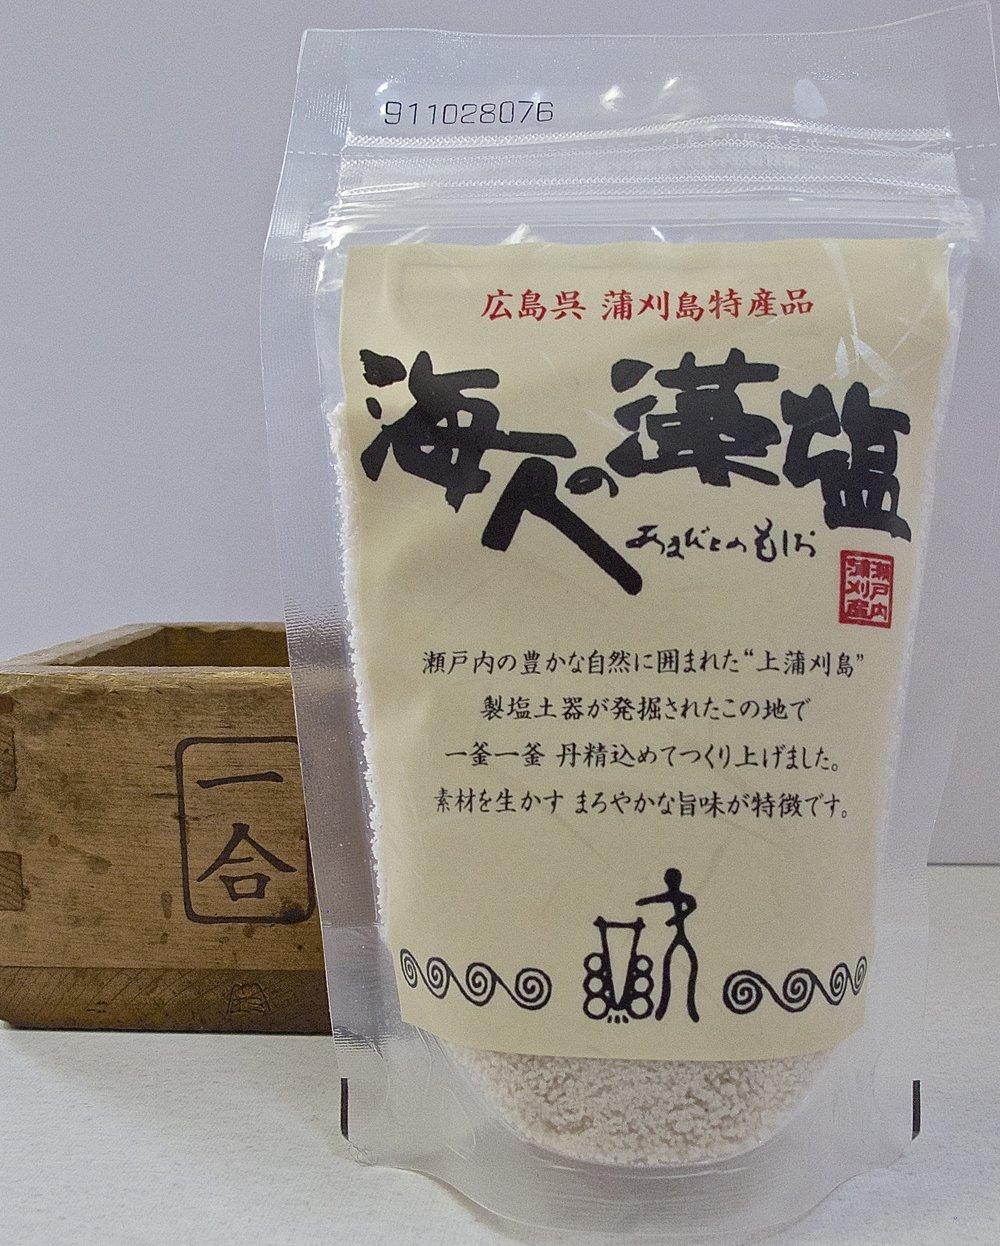 A 100 gram package of Amabito no Moshio.